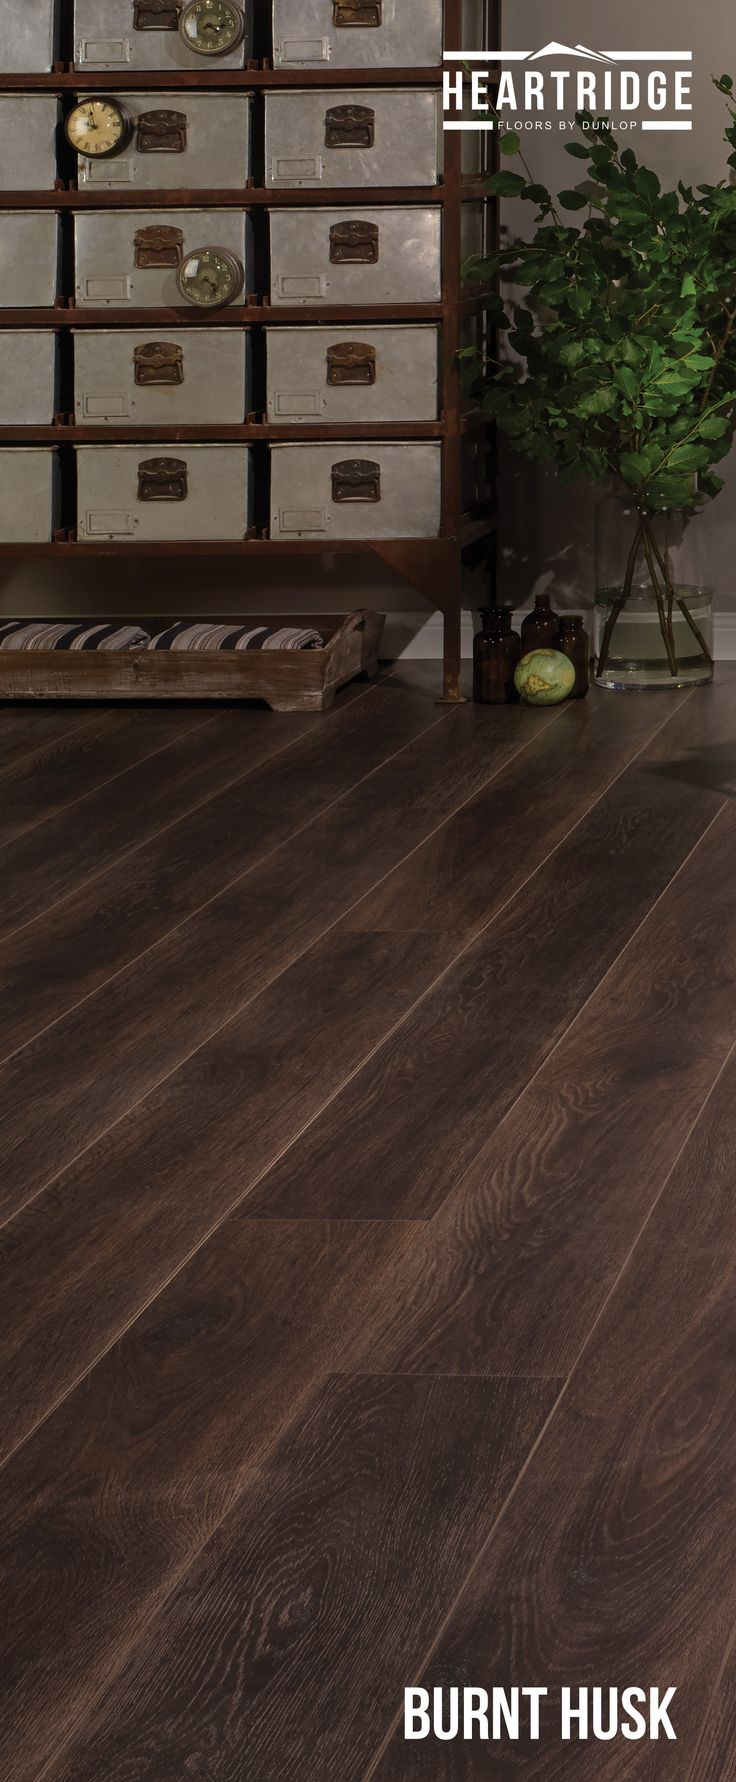 Heartridge Laminate Flooring in Smoked Oak, Burnt Husk